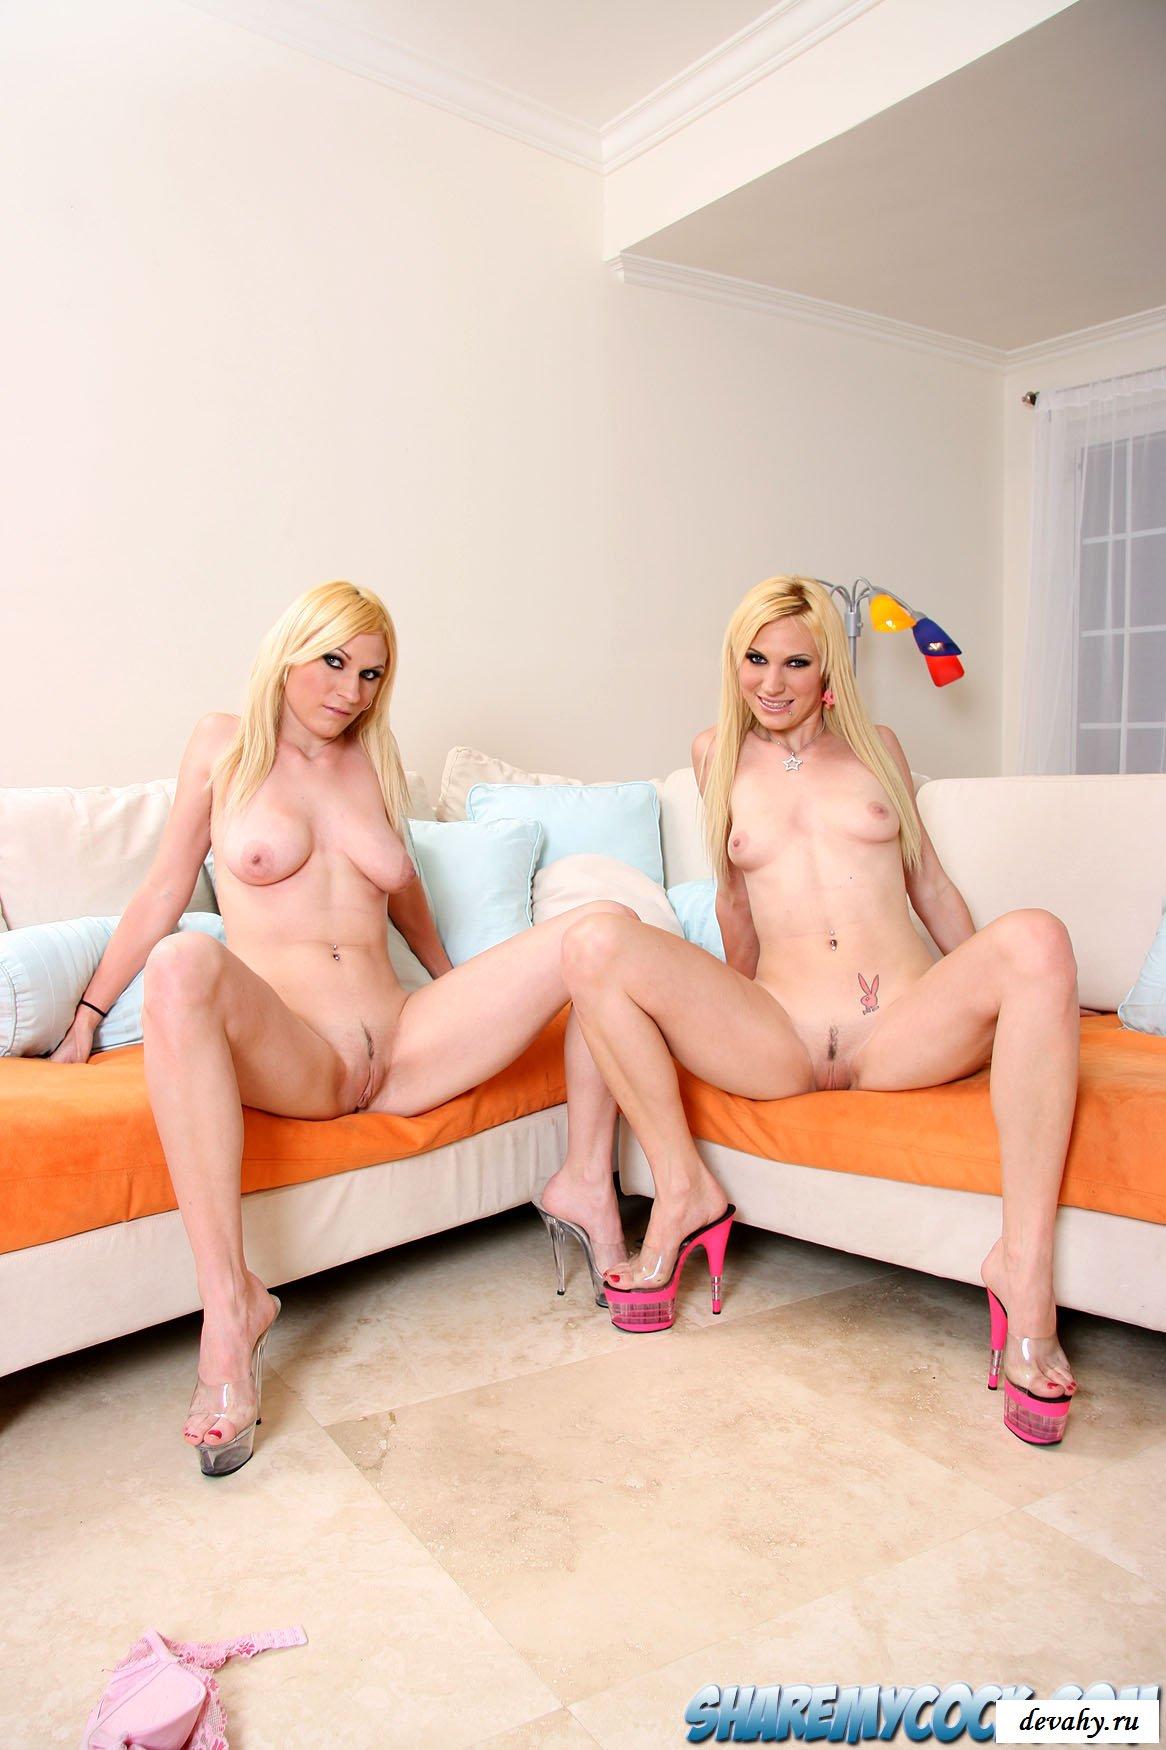 Белобрысые сестрёнки на тахте секс фото